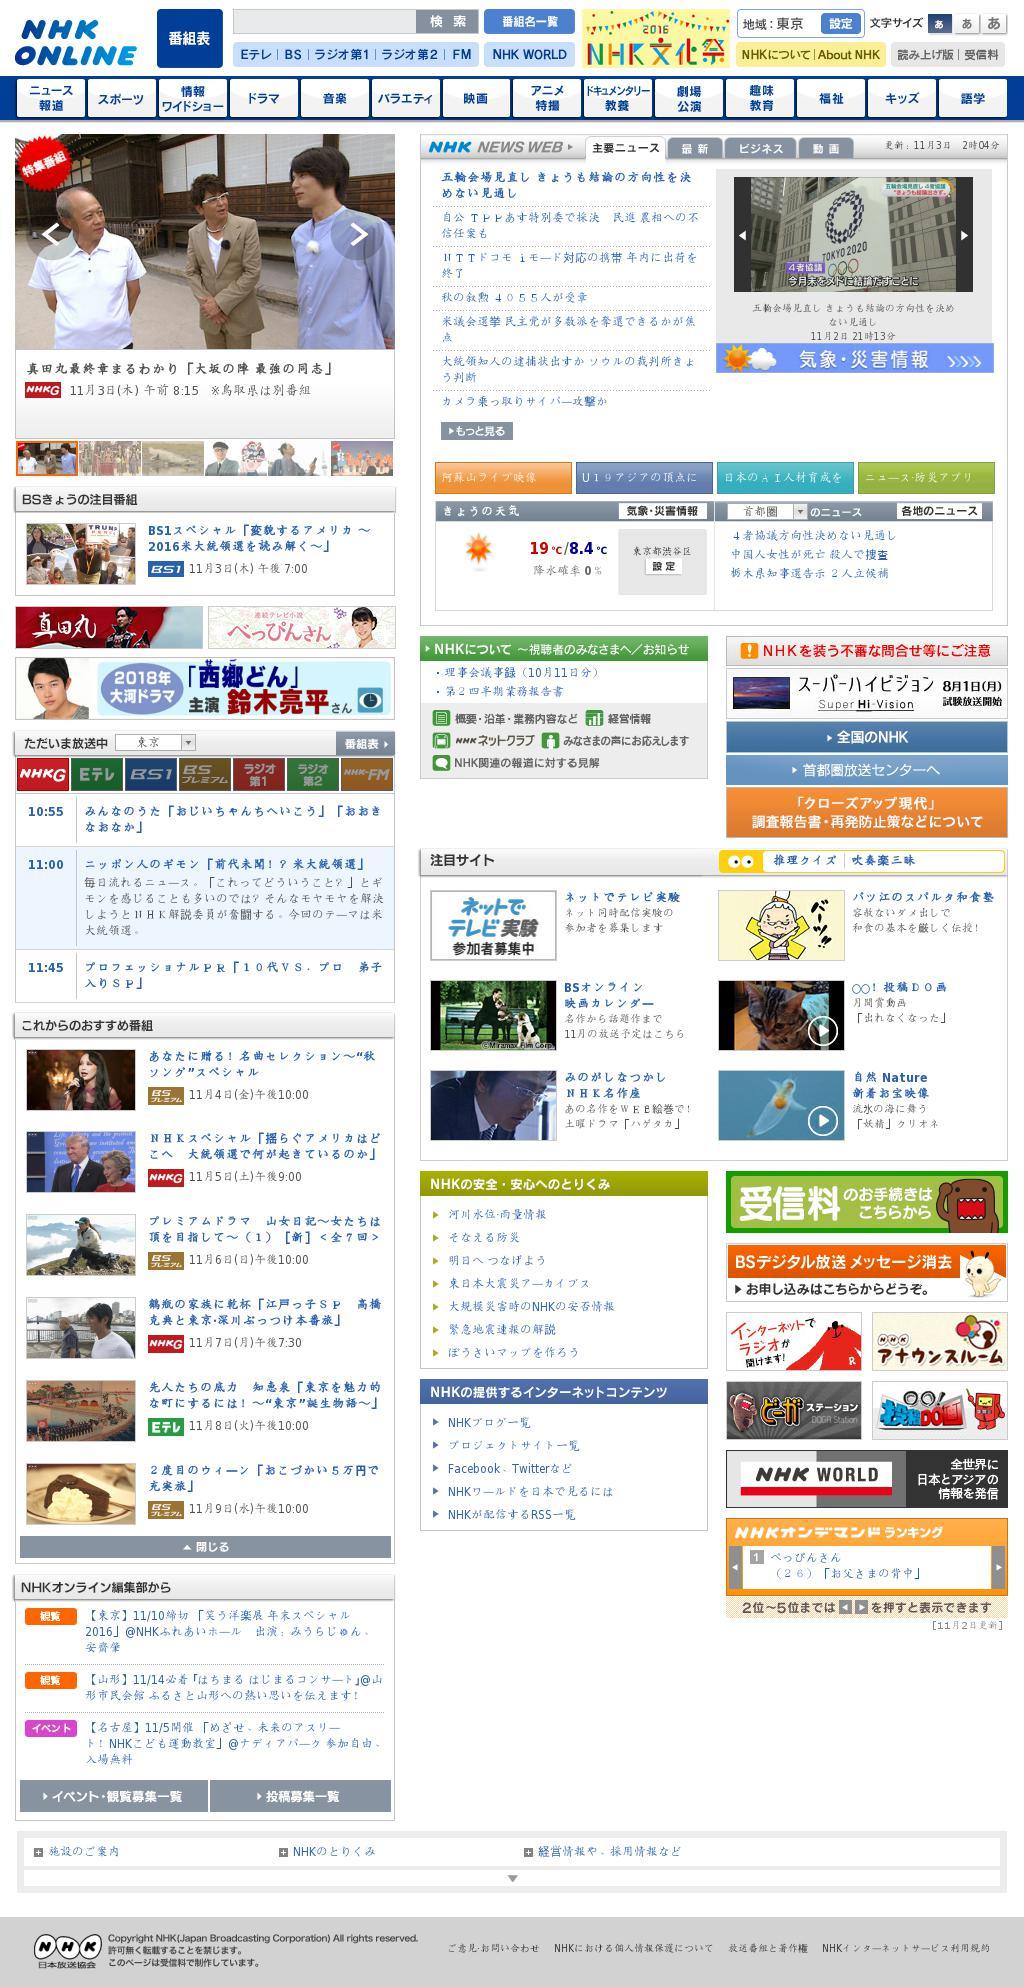 NHK Online at Thursday Nov. 3, 2016, 2:13 a.m. UTC